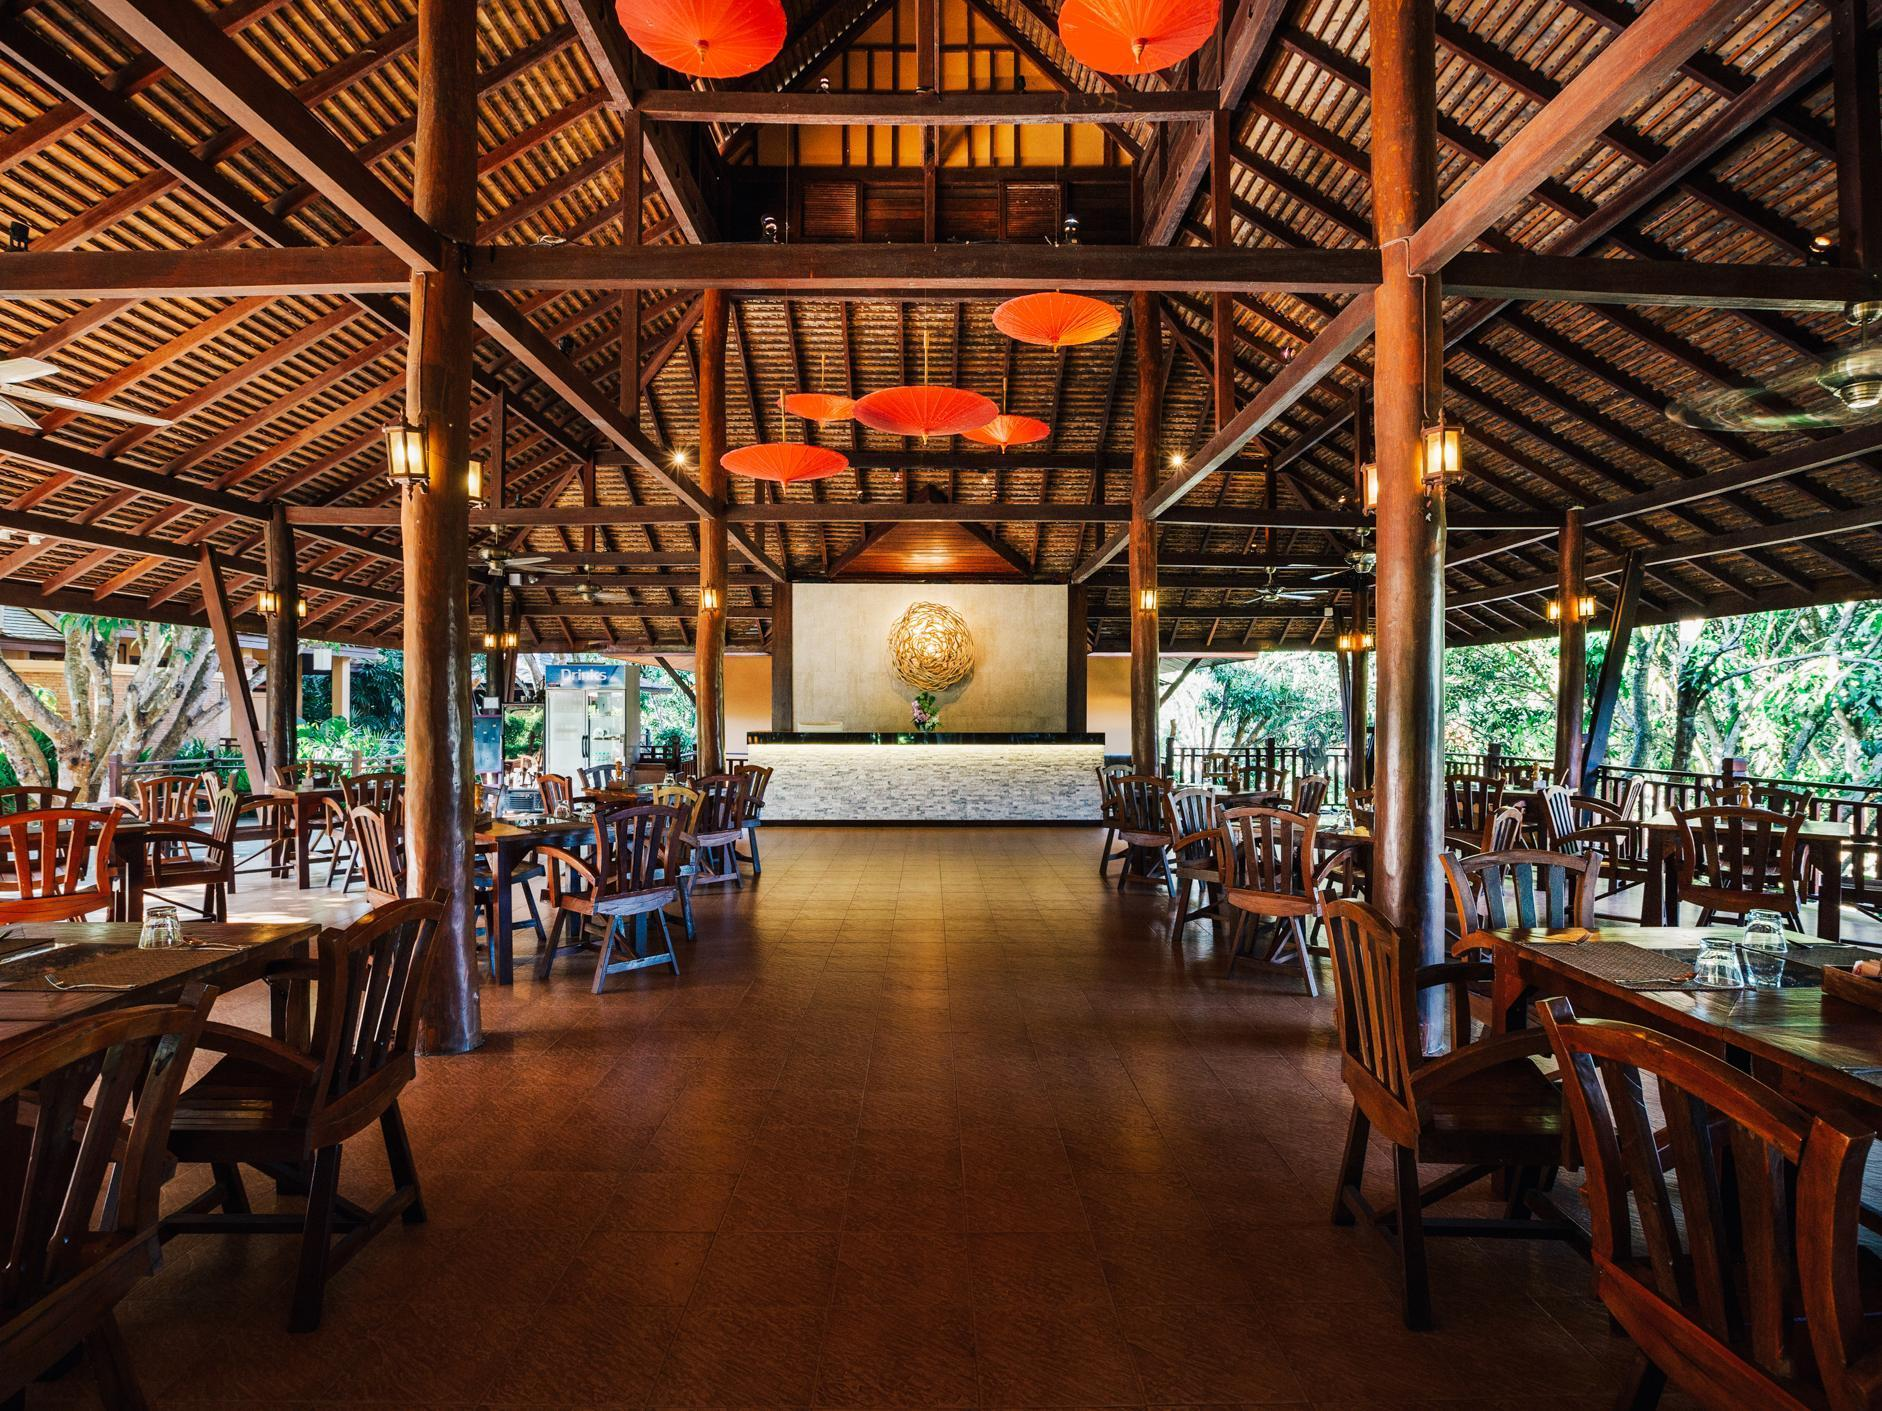 Pantip รีวิว เดอะ ภาวนา เชียงใหม่ รีสอร์ต (The Pavana Chiang Mai Resort) [CR] Pantip